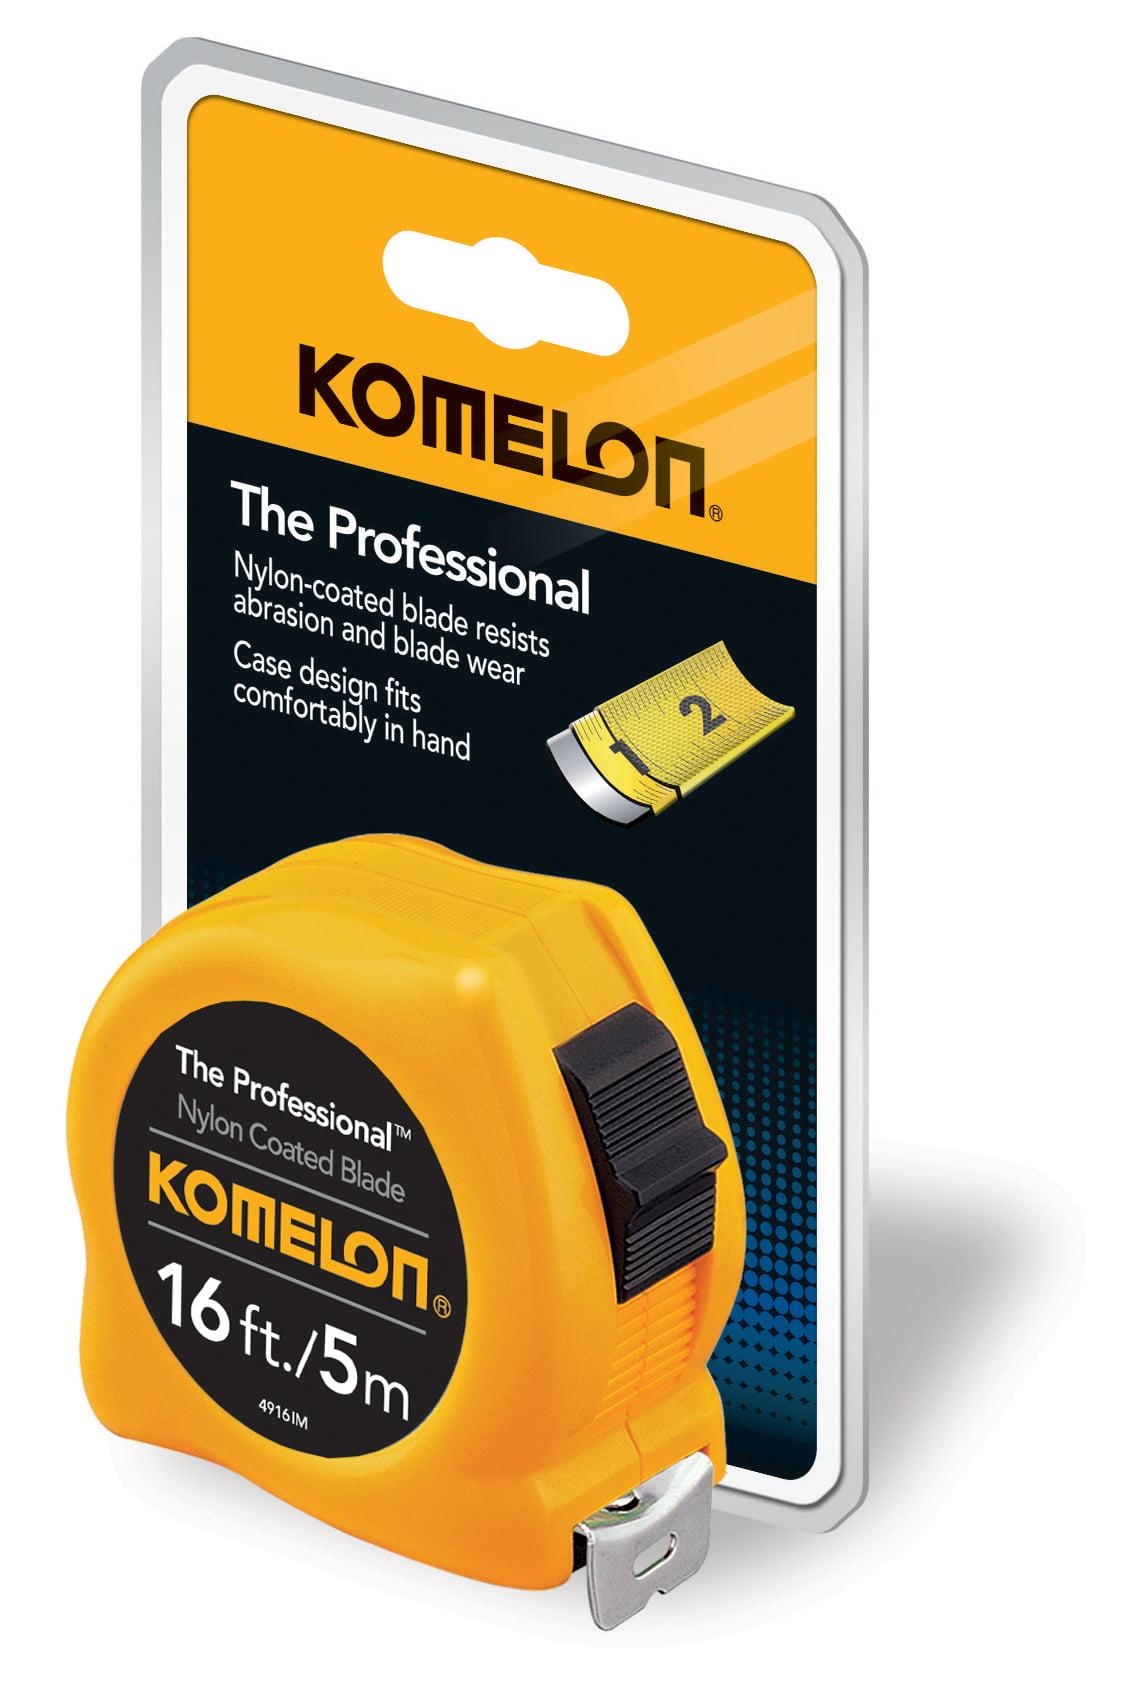 Komelon 16' 5m Professional Inch Metric Tape Measure by Komelon Corporation